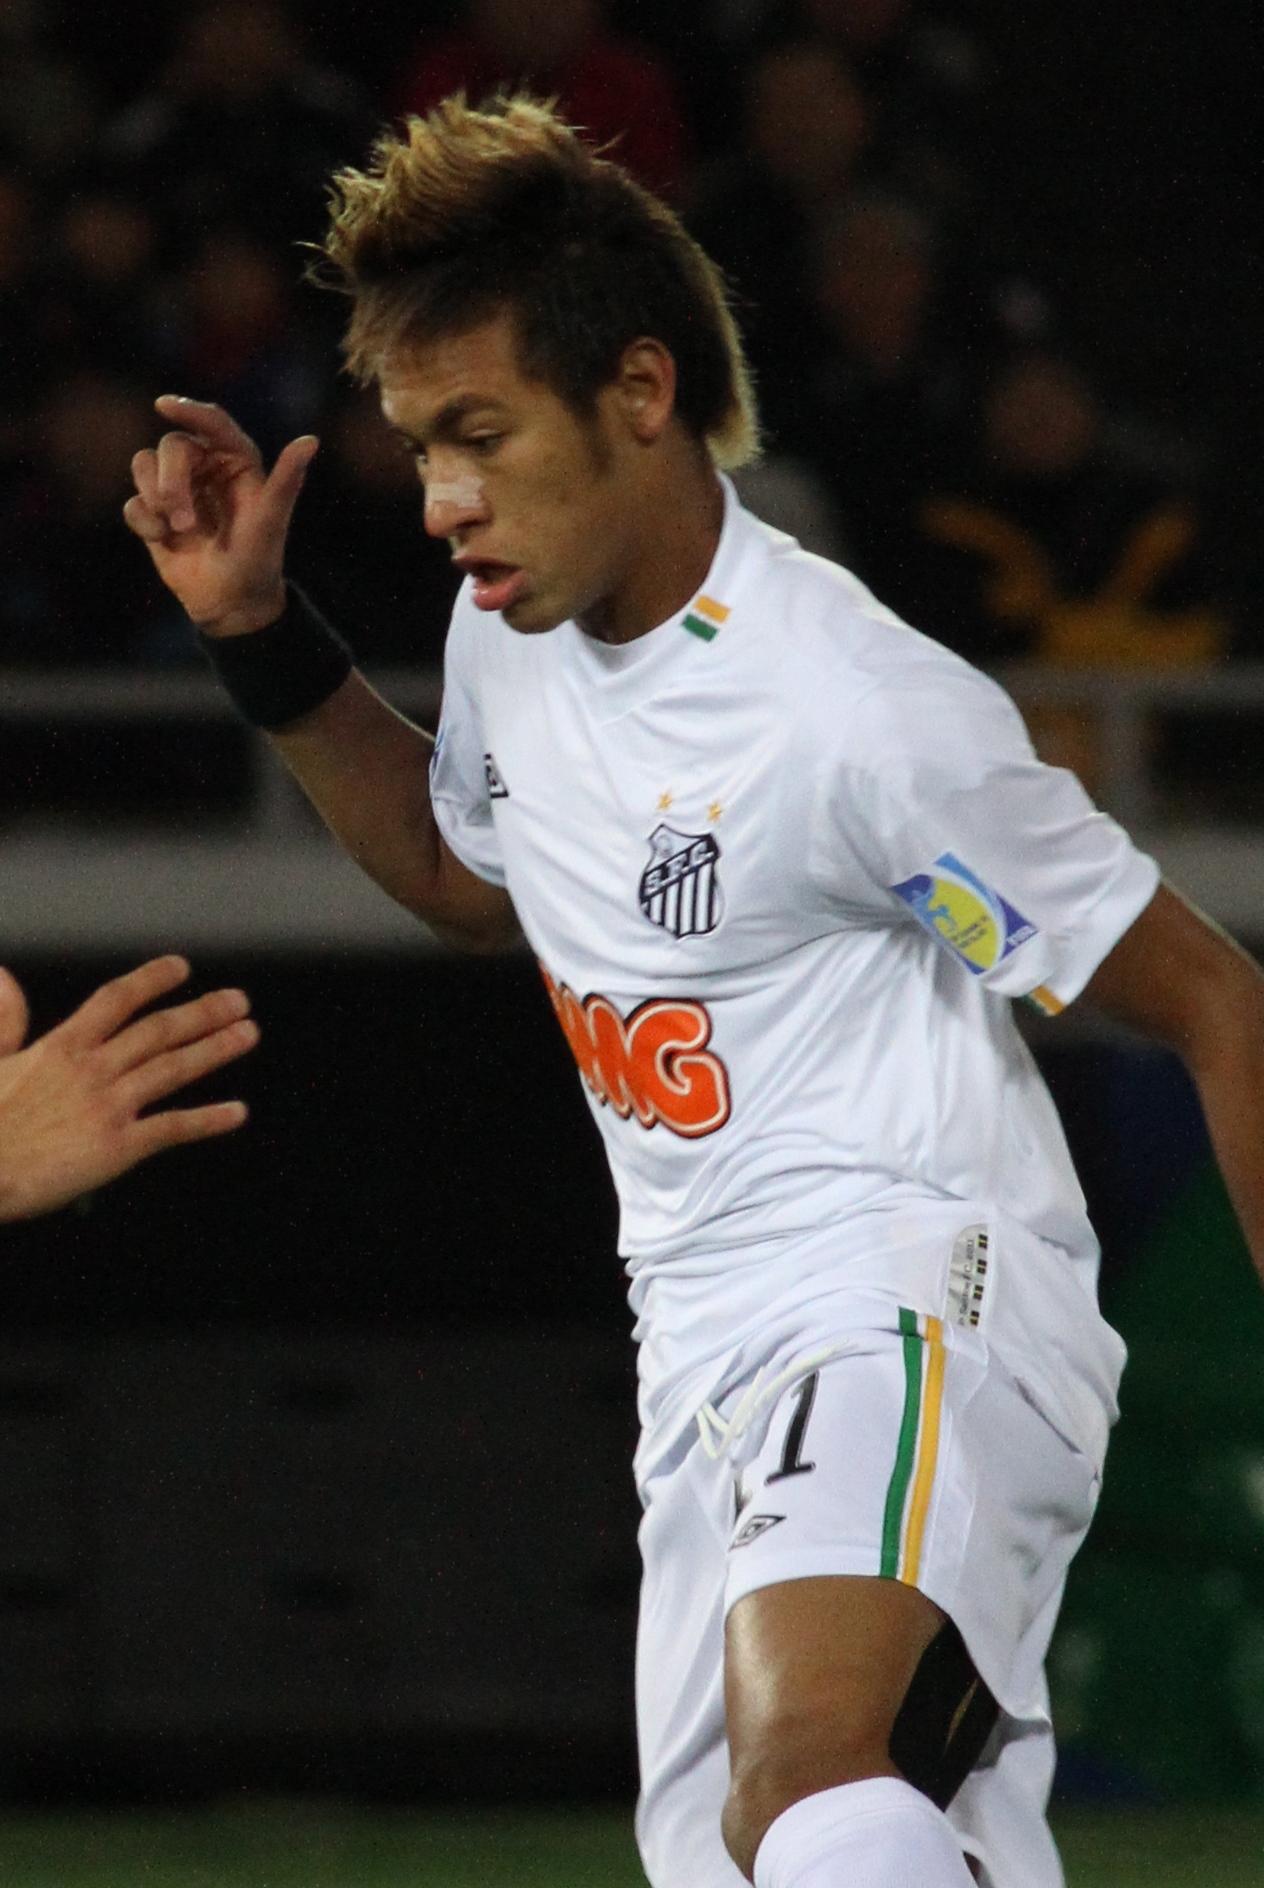 1a62ee2f13 File:Neymar Junior the Future of Brazil 2 (cropped).jpg - Wikimedia ...